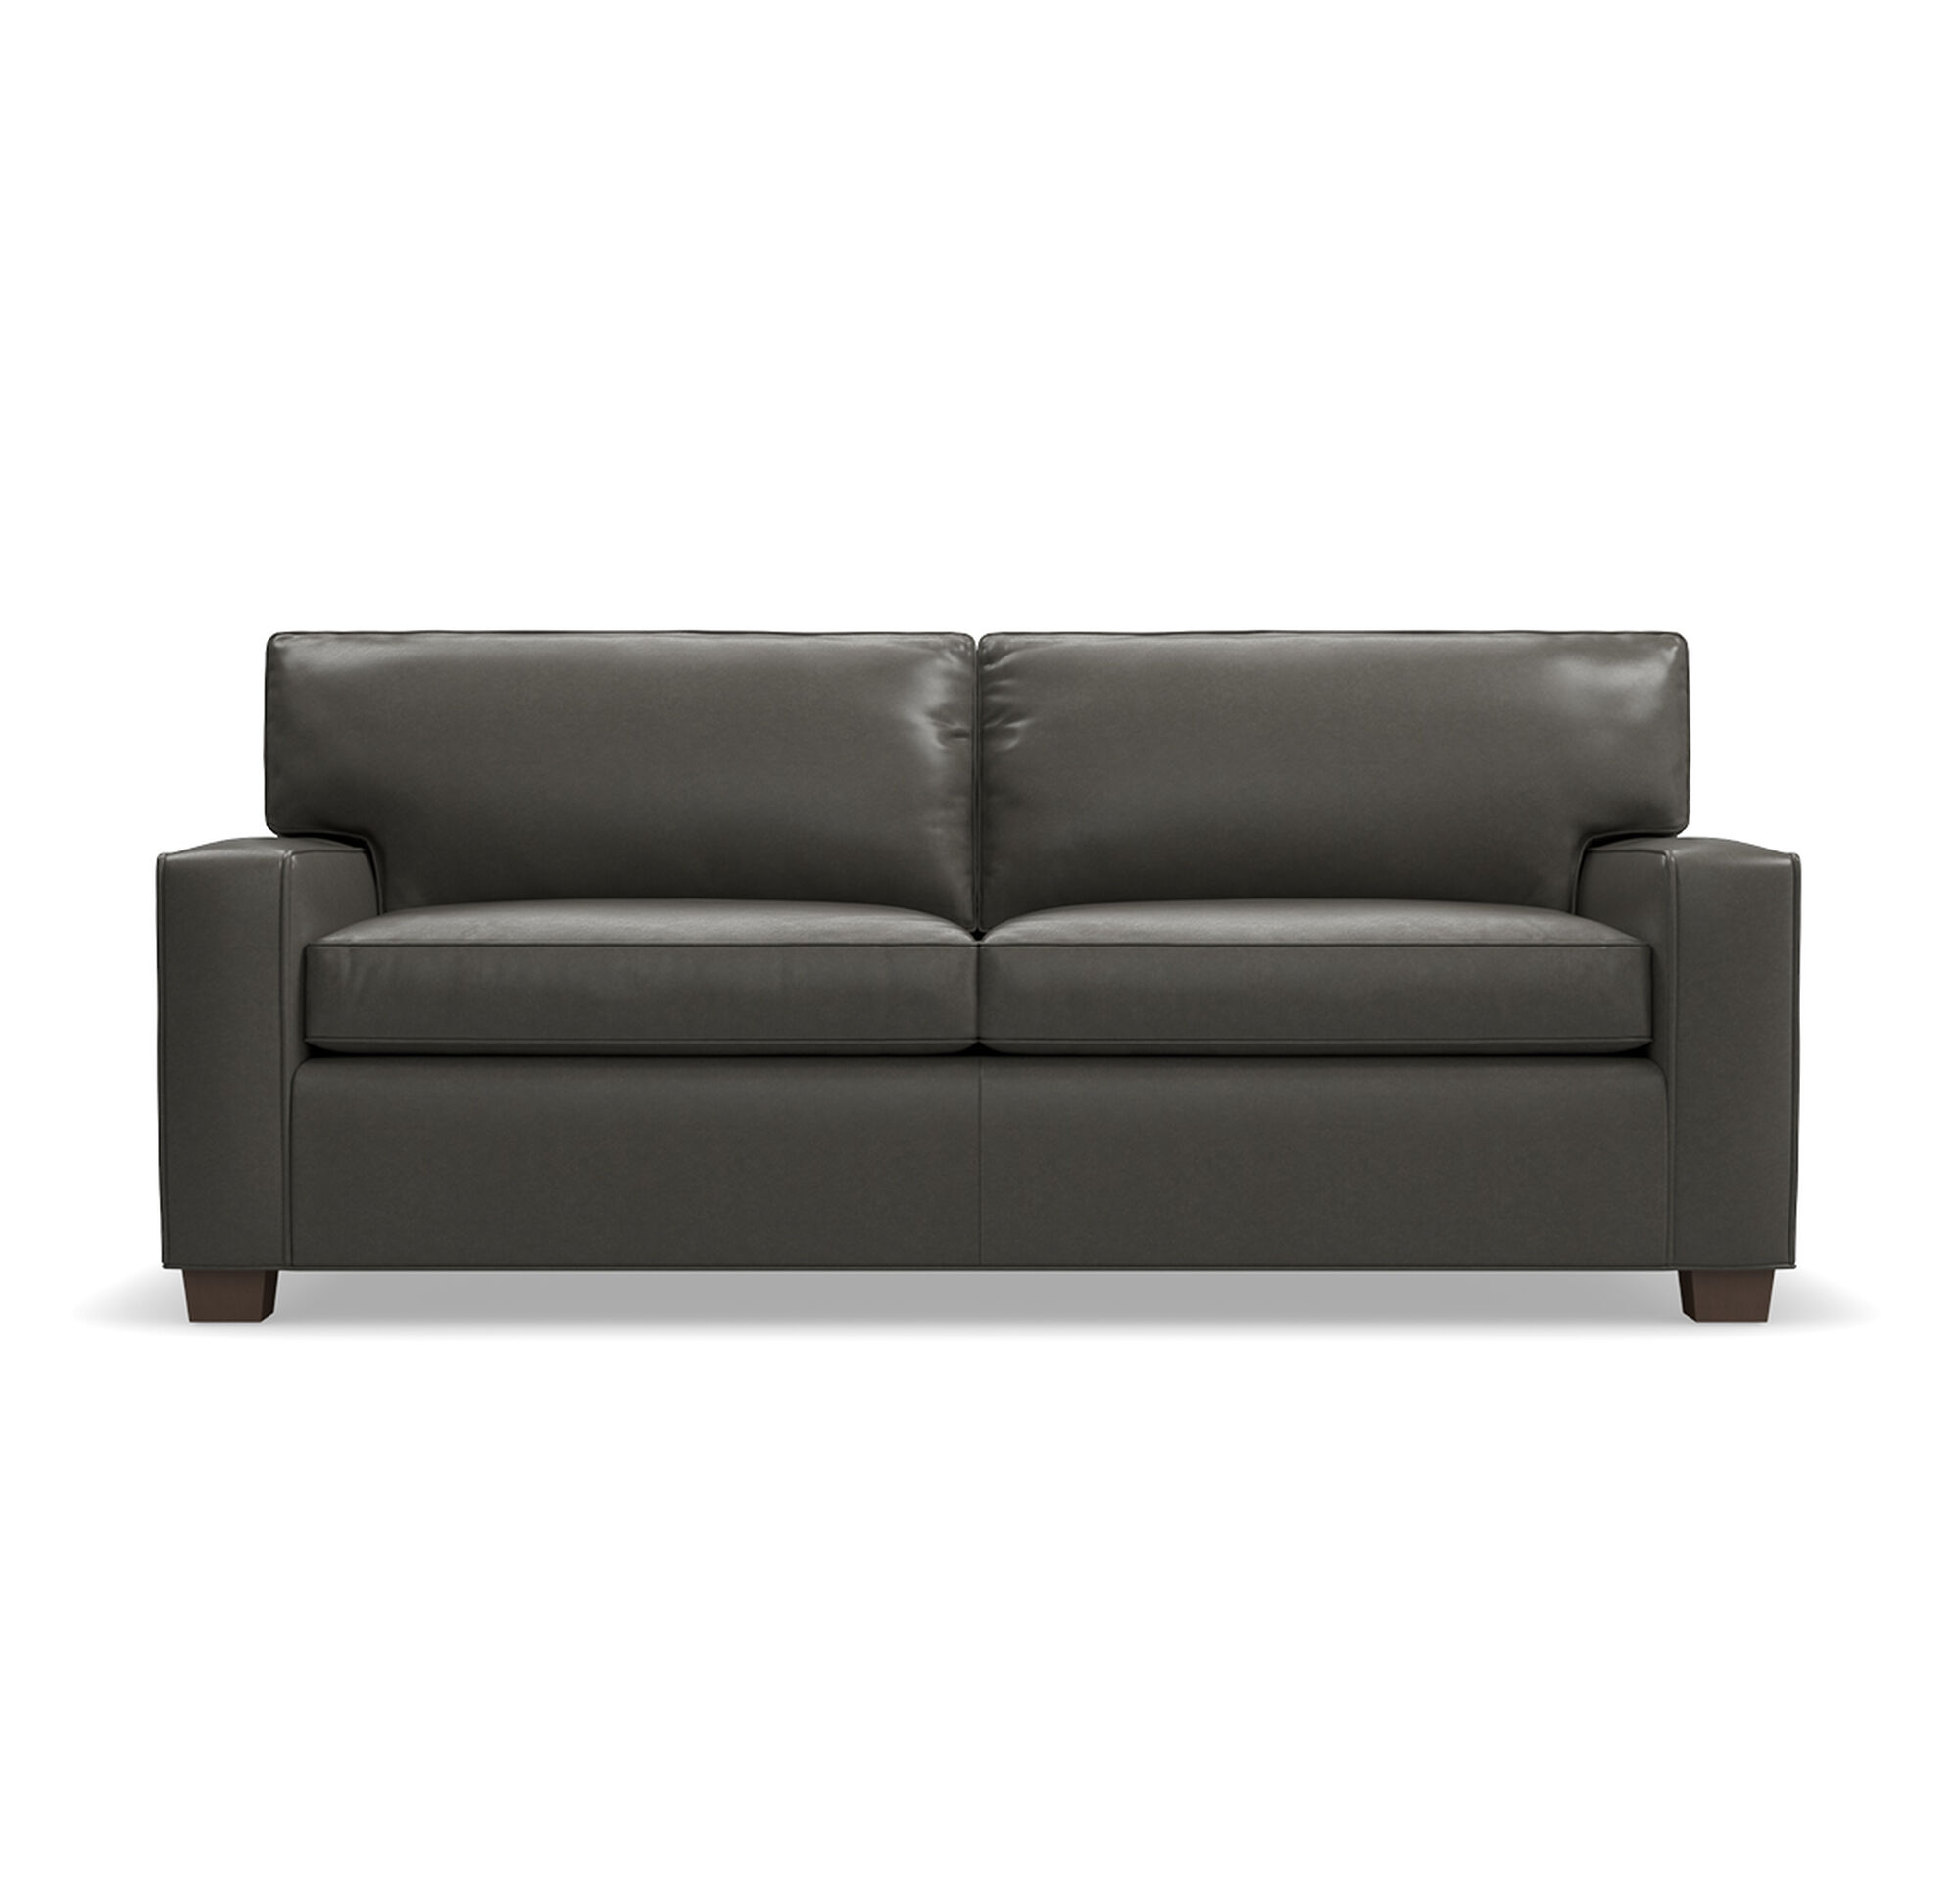 alex leather super luxe queen sleeper sofa. Black Bedroom Furniture Sets. Home Design Ideas